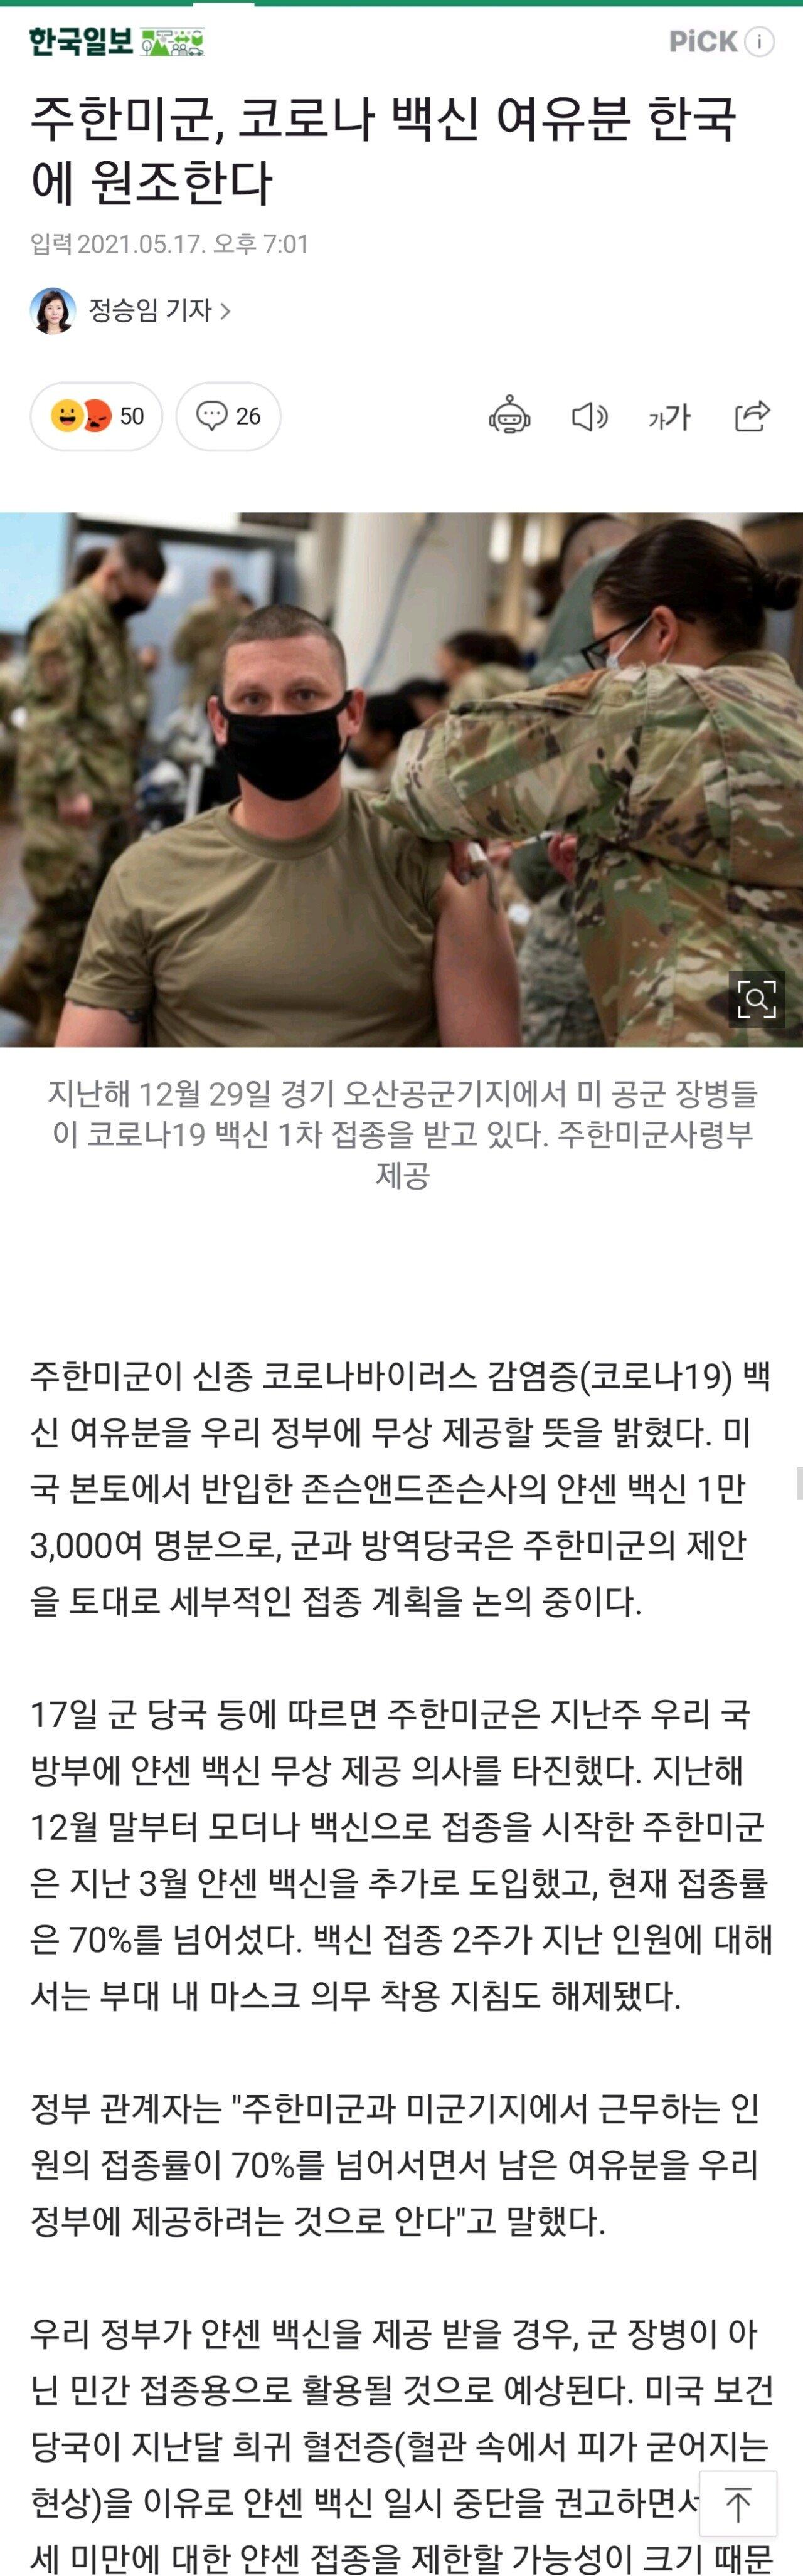 Screenshot_20210517-232732_Chrome.jpg 주한미군, 코로나 백신 여유분 한국에 원조한다.